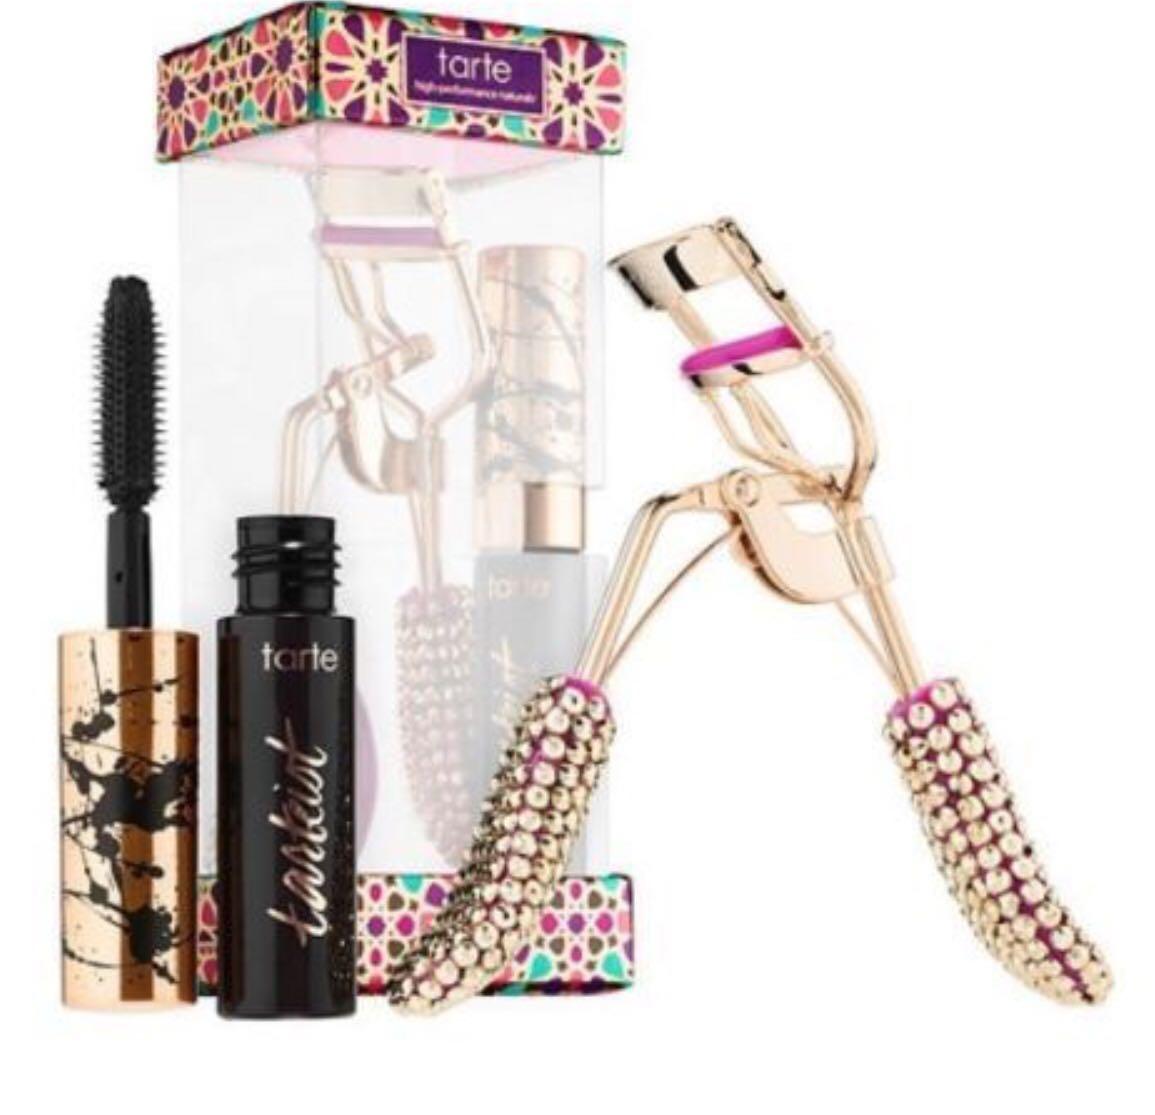 Bn Tarte Eyelash Curler Limited Edition Health Beauty Makeup On